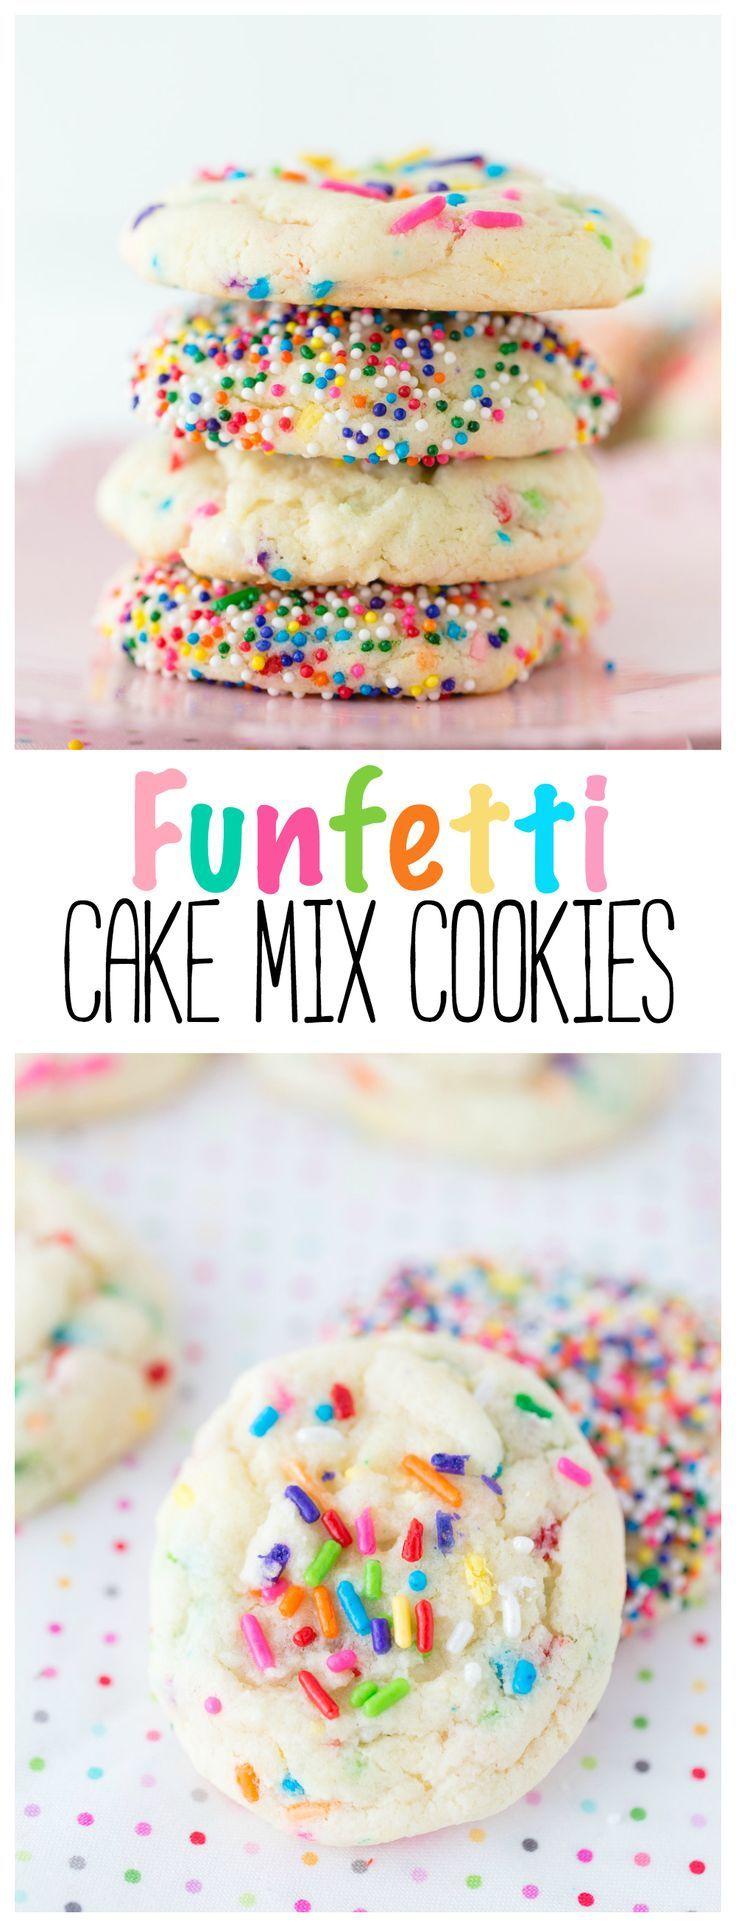 Funfetti Cake Mix Cookies | Cookies | Cake Mix Recipe | Cake Mix | Birthday | Desserts |